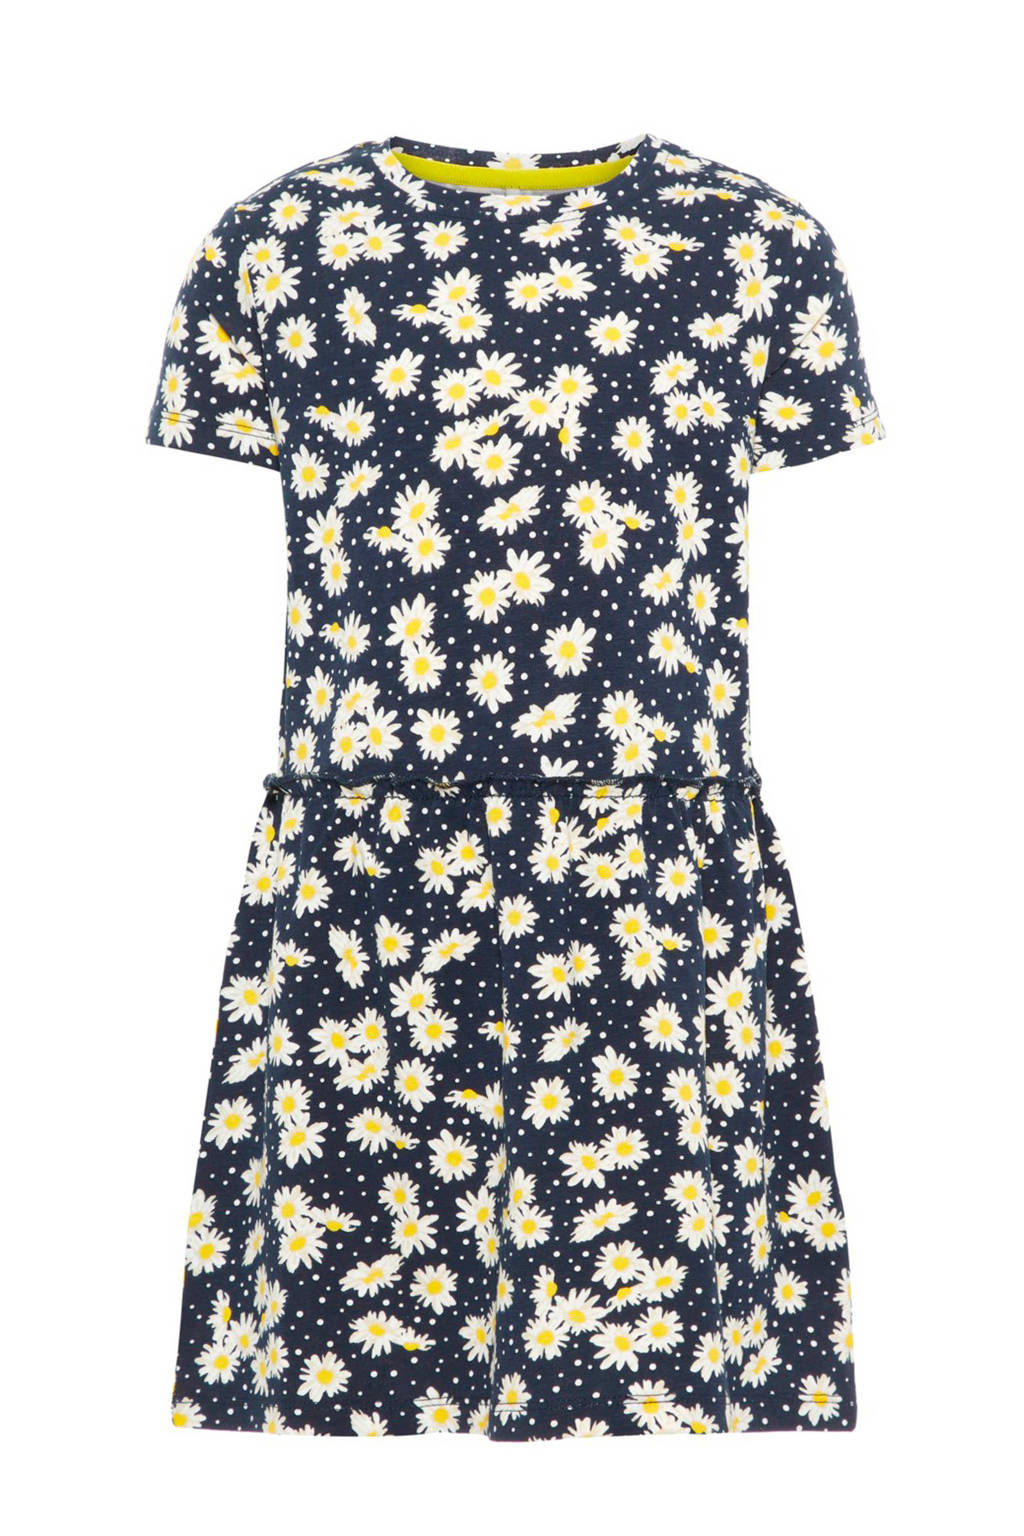 name it MINI jurk FAllon met madeliefjesprint donkerblauw, Donkerblauw/ wit/ geel